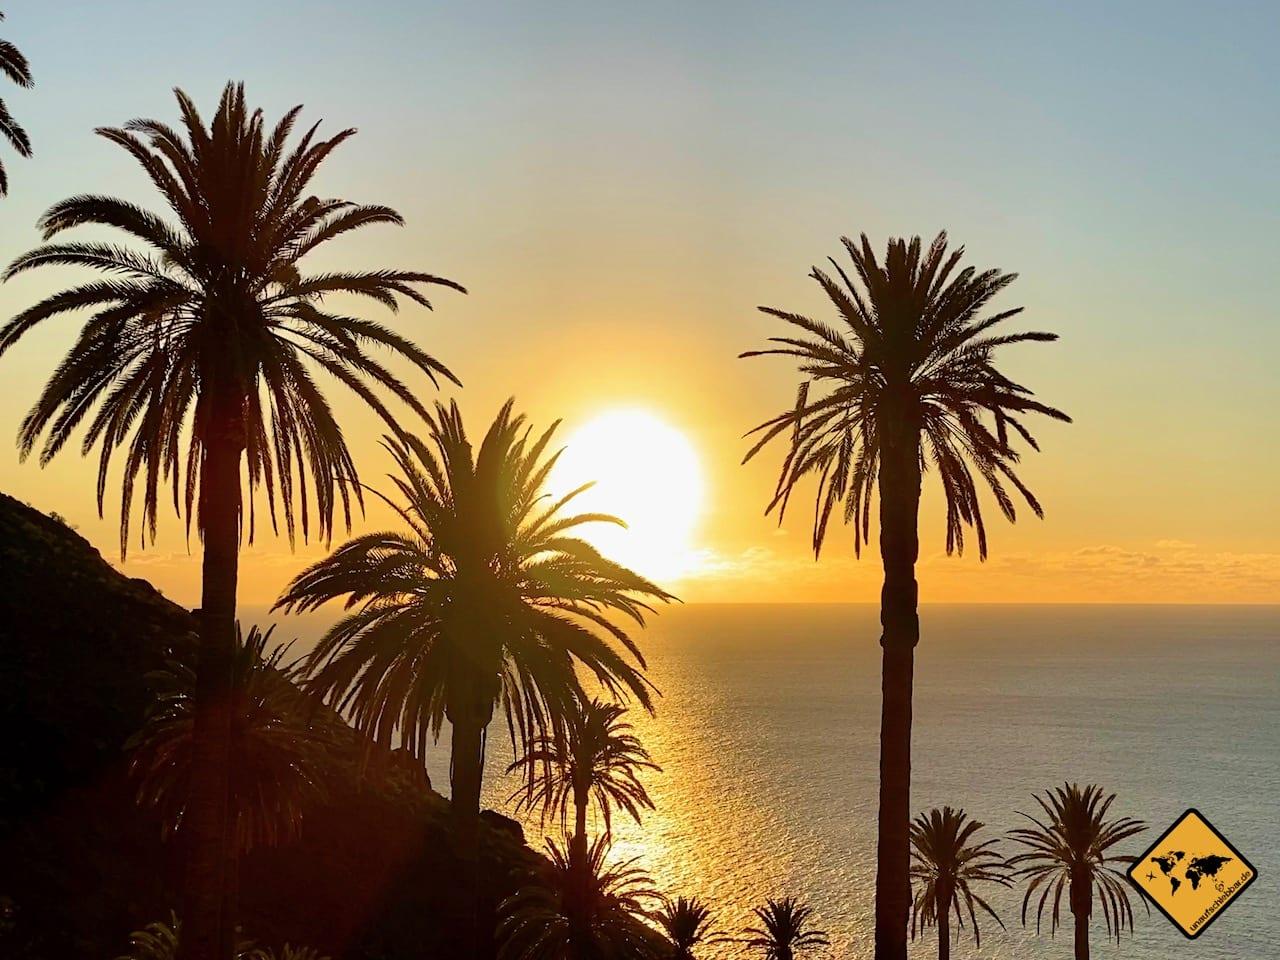 Sonnenuntergang Palmen Taguluche